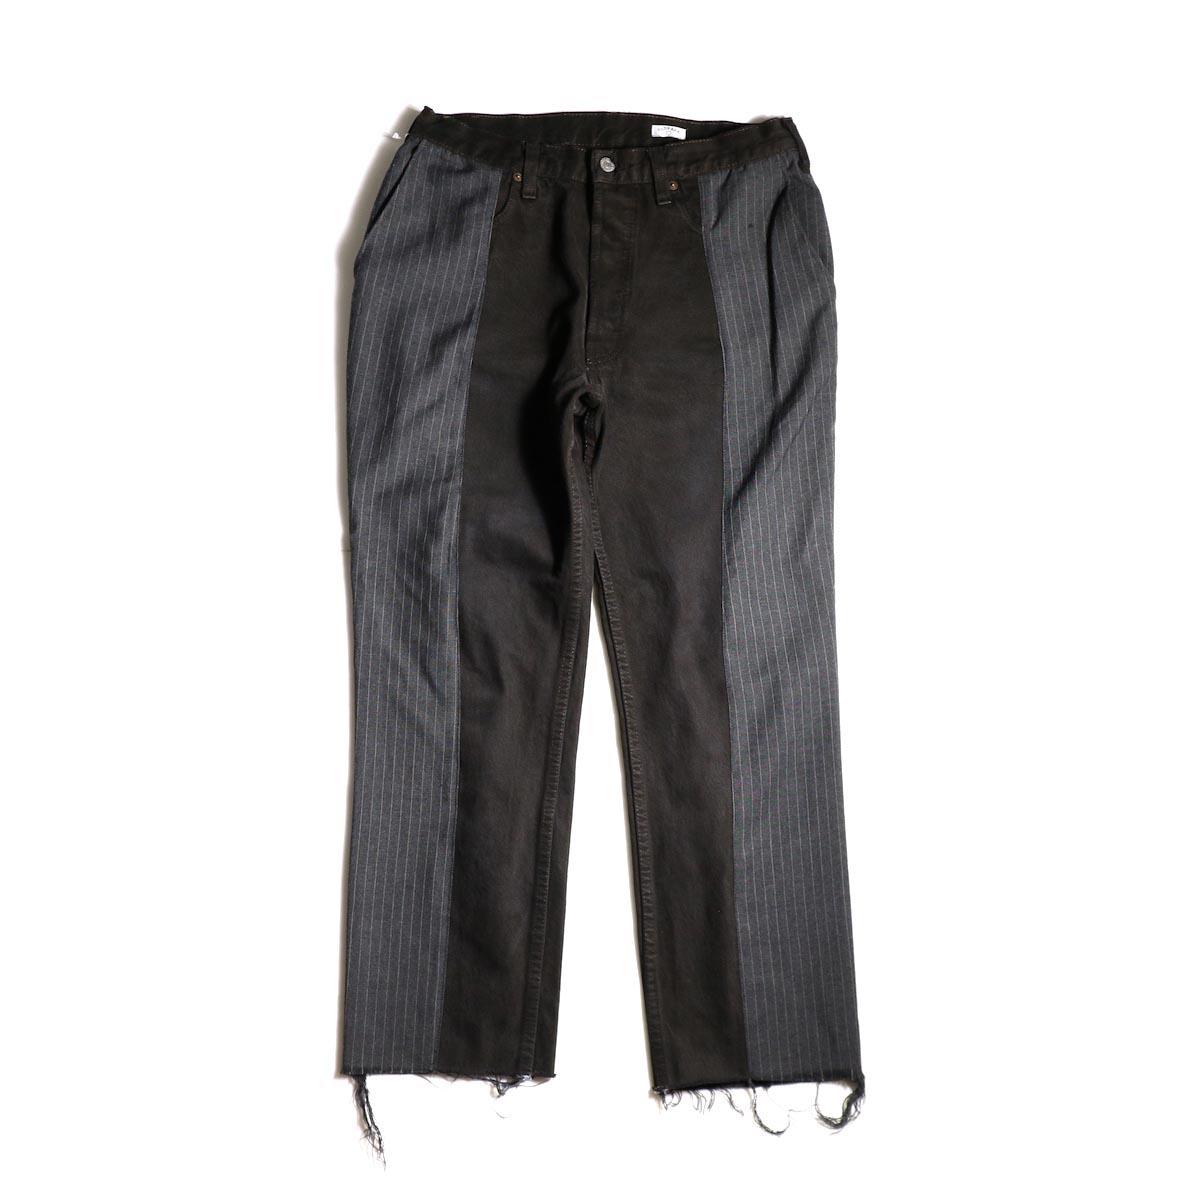 OLD PARK / Docking Jeans Black (Msize-B)